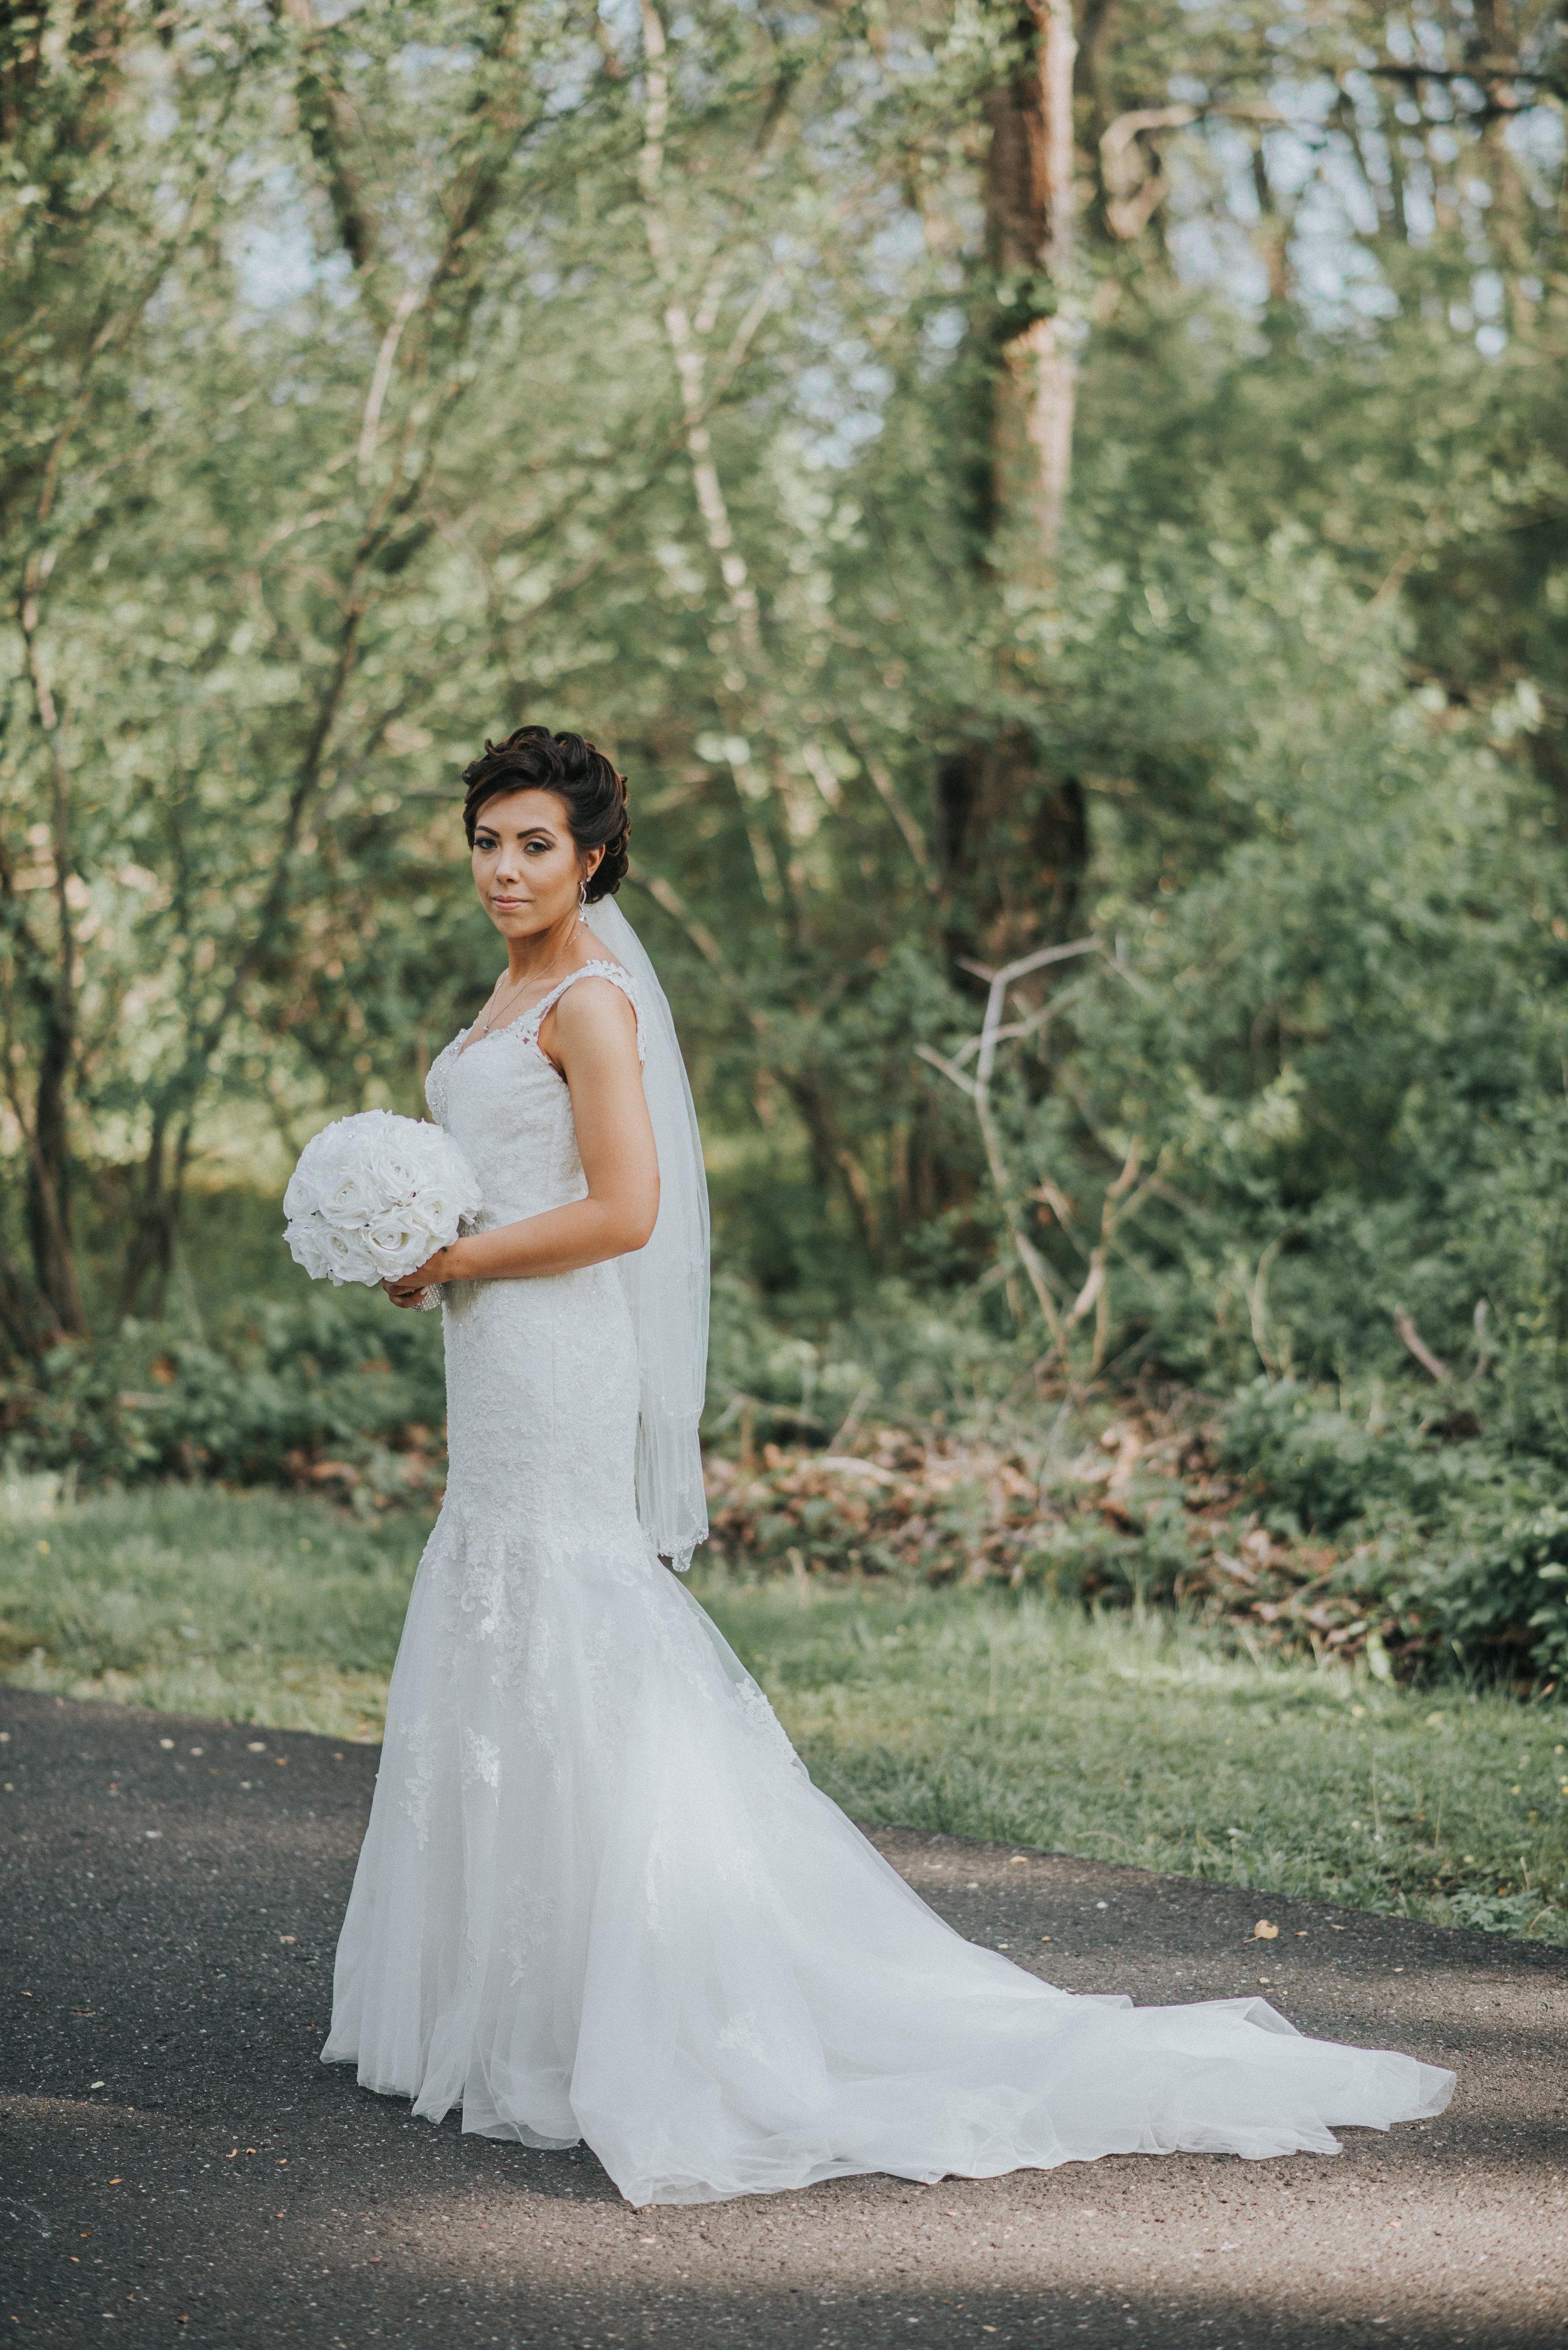 Christina-and-Gene-Wedding-Marla-Rain-Photography-241.jpg